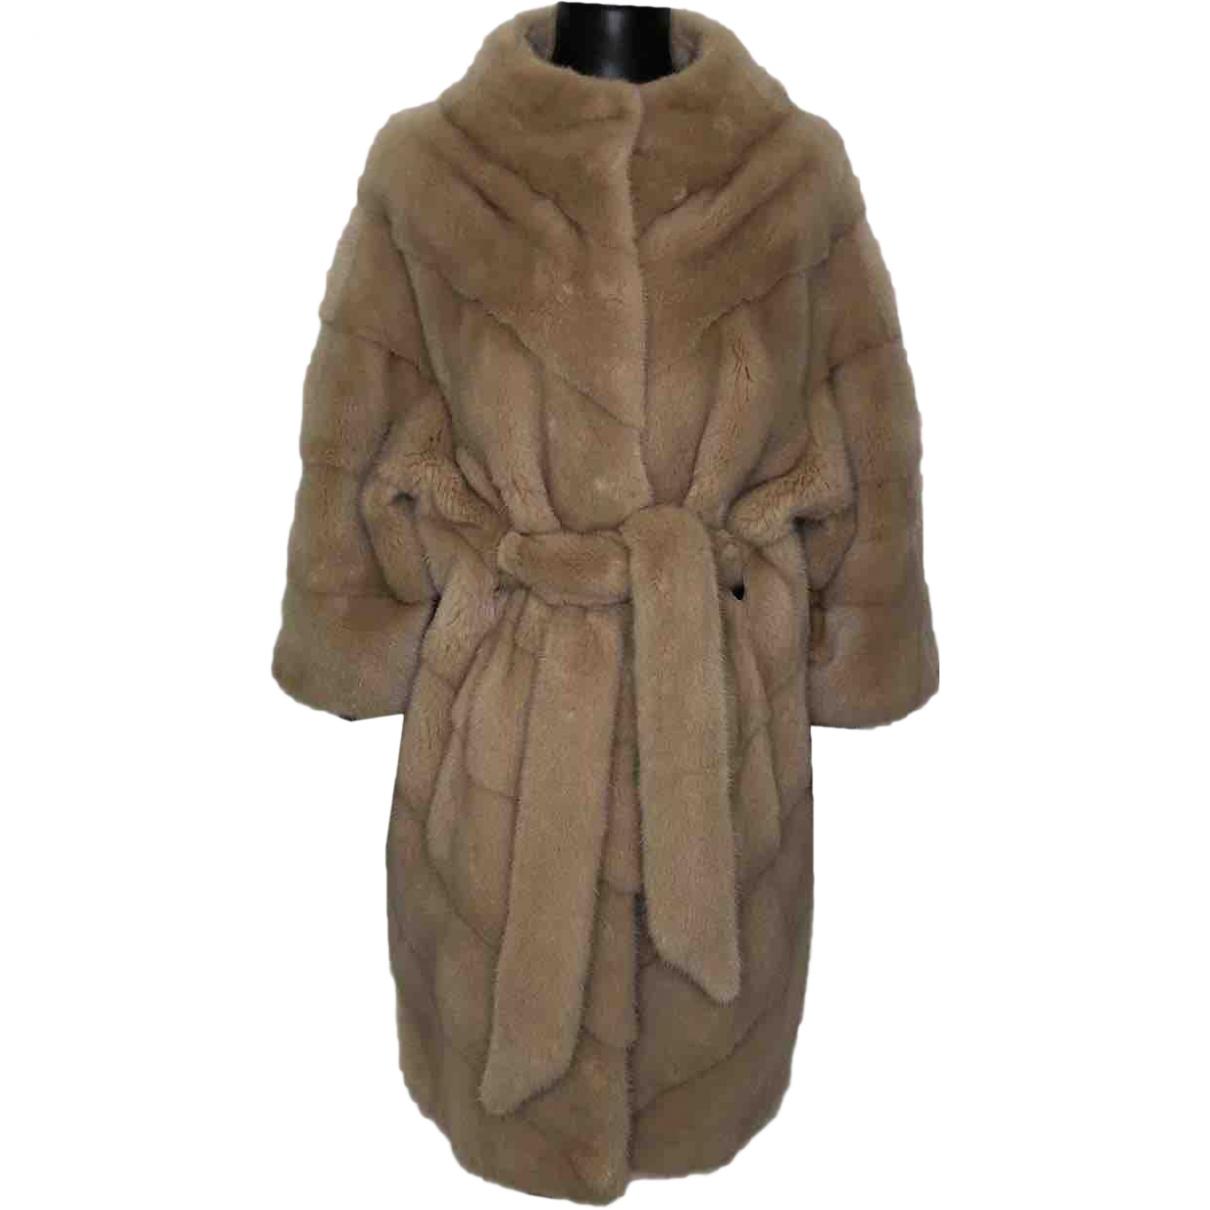 Braschi \N Beige Mink coat for Women S International